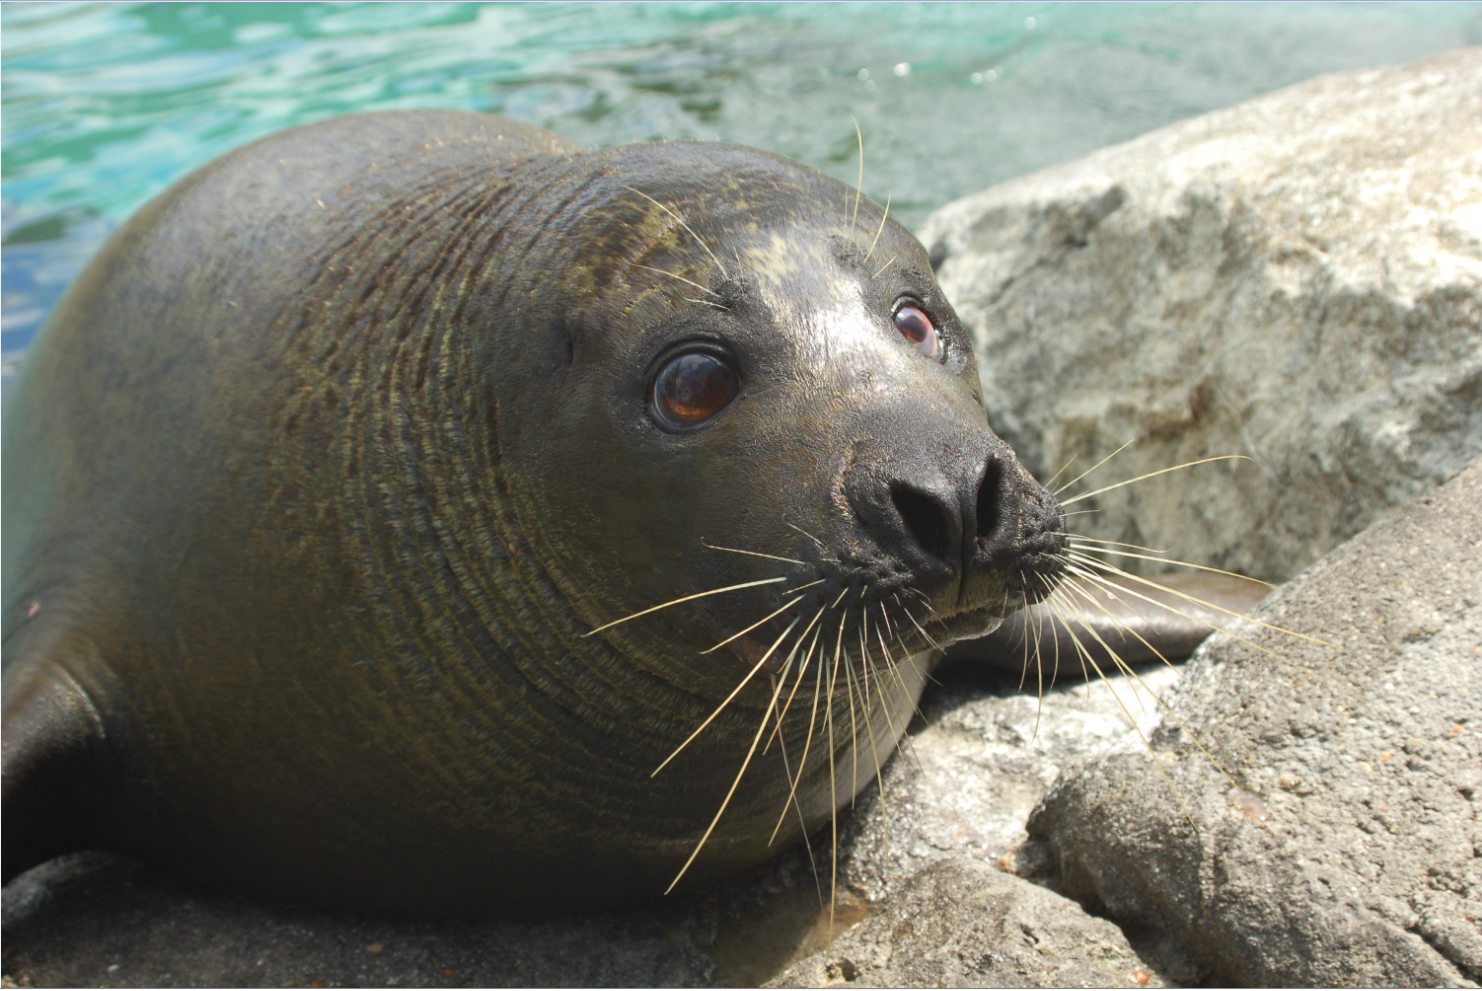 Beloved Virginia Aquarium Harbor Seal Norton Passes Away